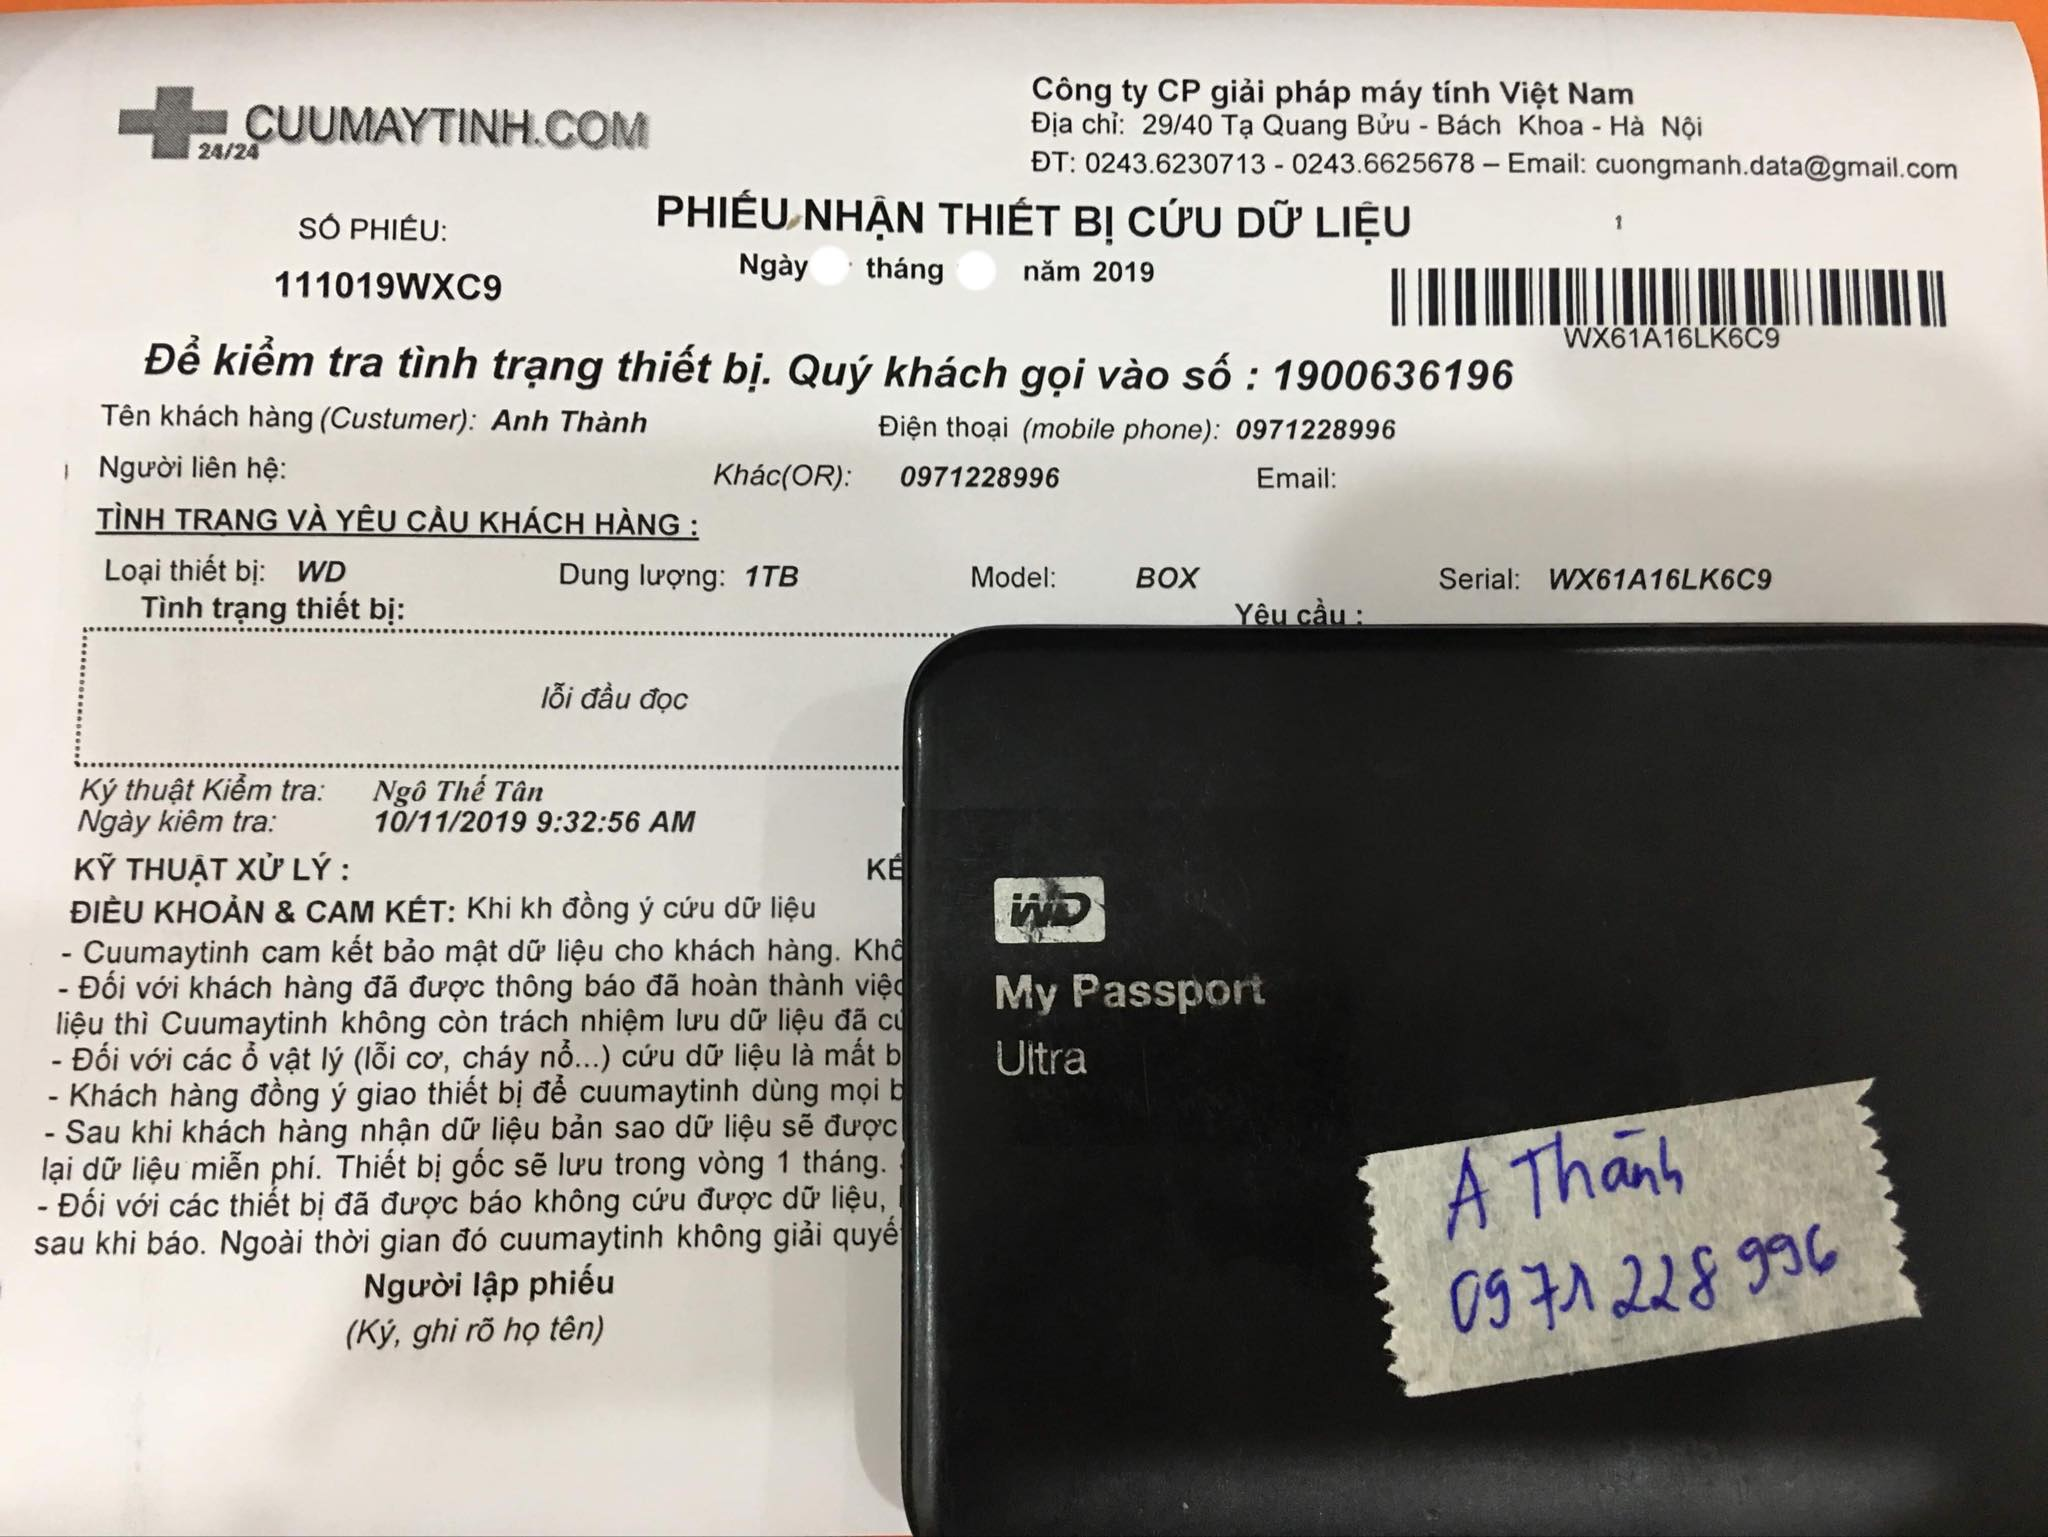 Lấy dữ liệu ổ cứng Western 1TB lỗi đầu đọc 05/11/2019 - cuumaytinh